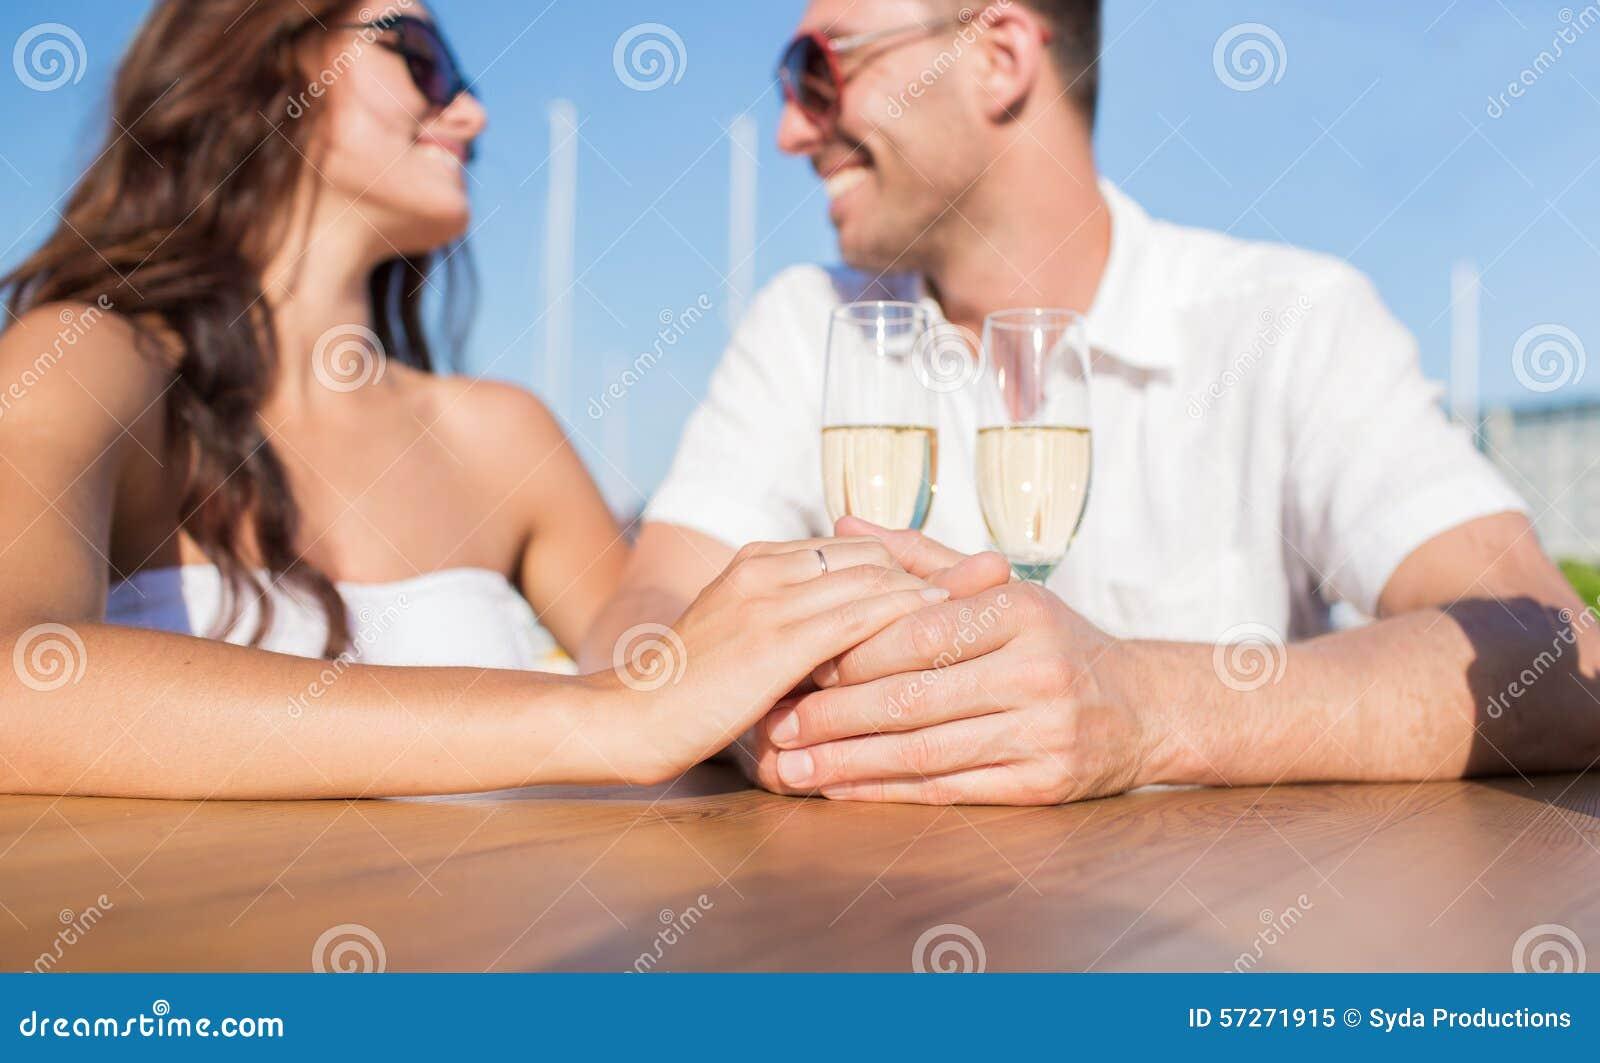 Dating asian ohio cincinnati, First good dating message website